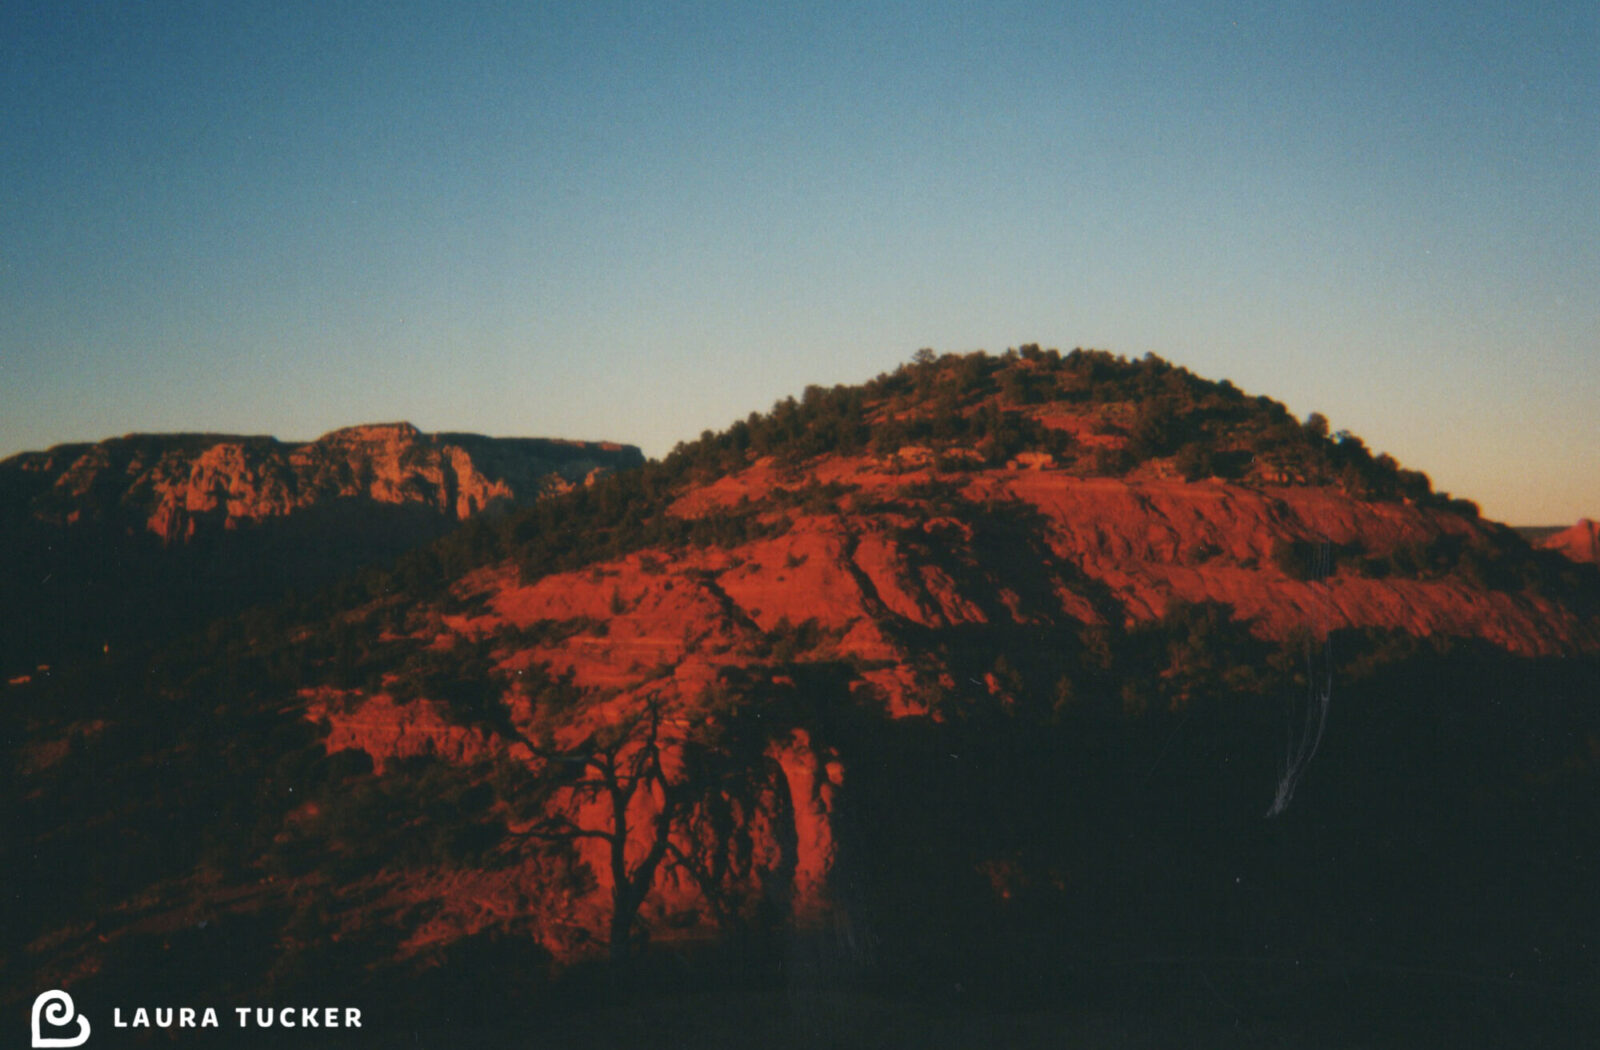 Memoir First Trip to Sedona - Part Four